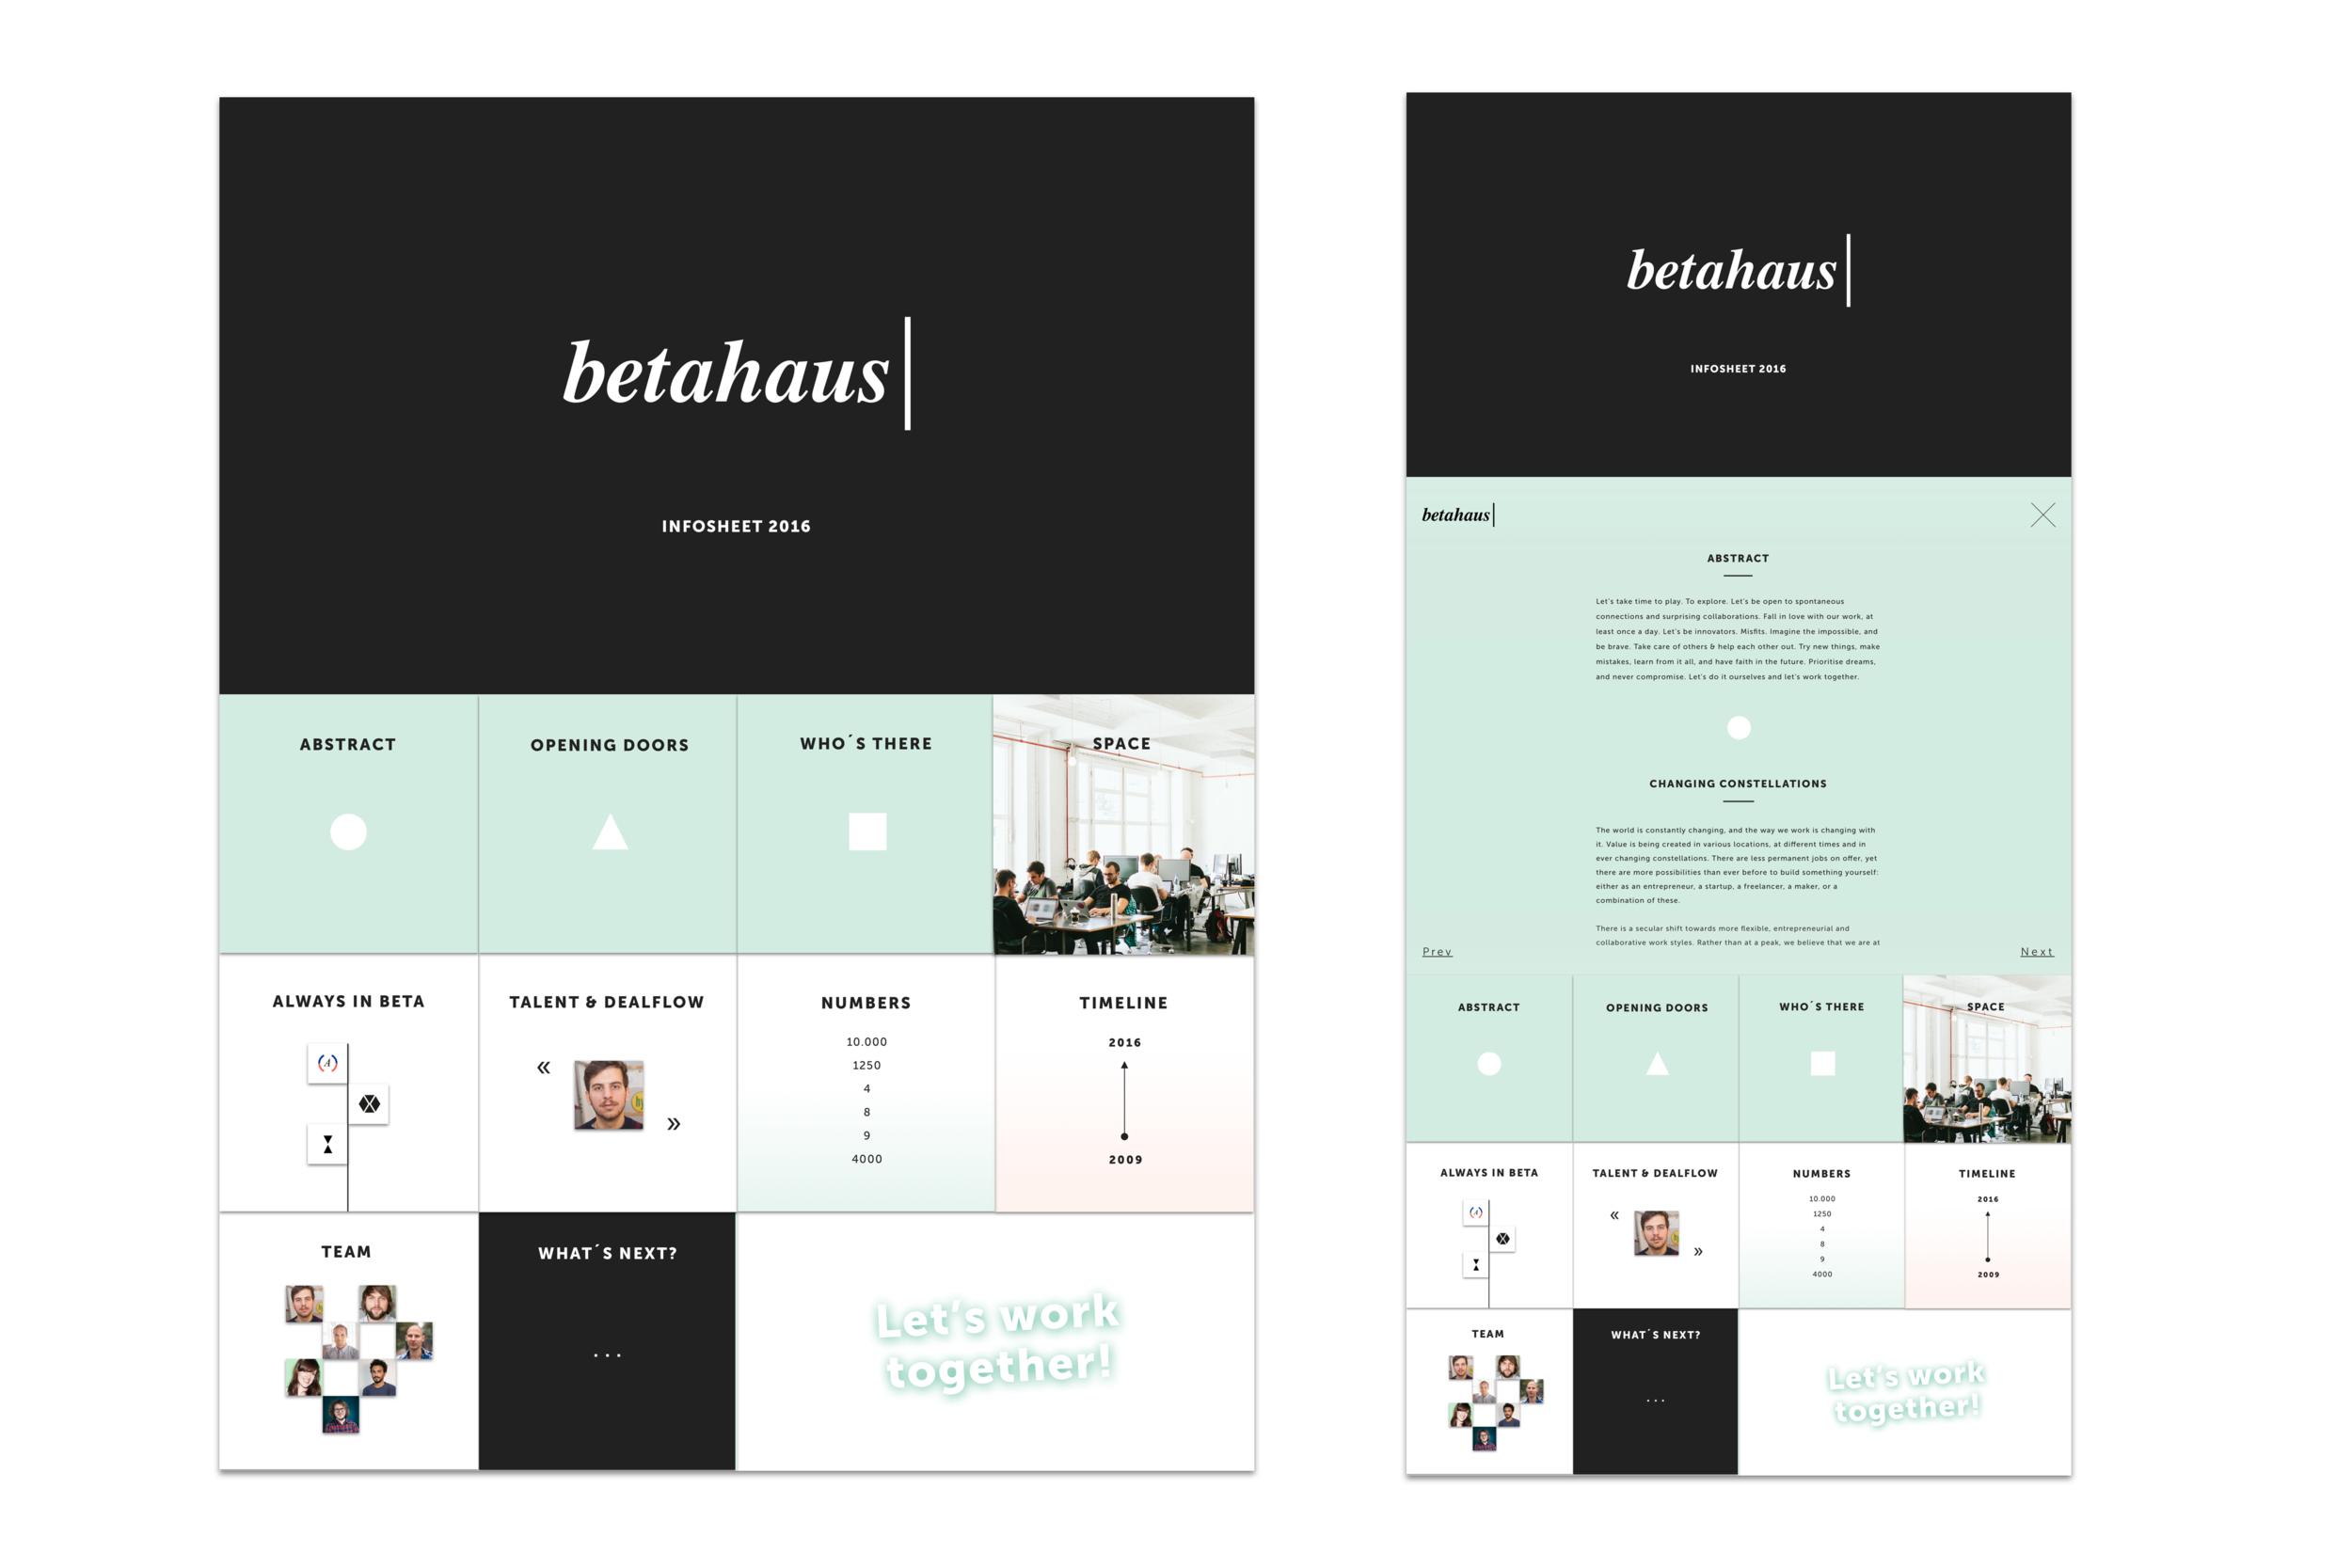 betahaus_storybook_menu.png